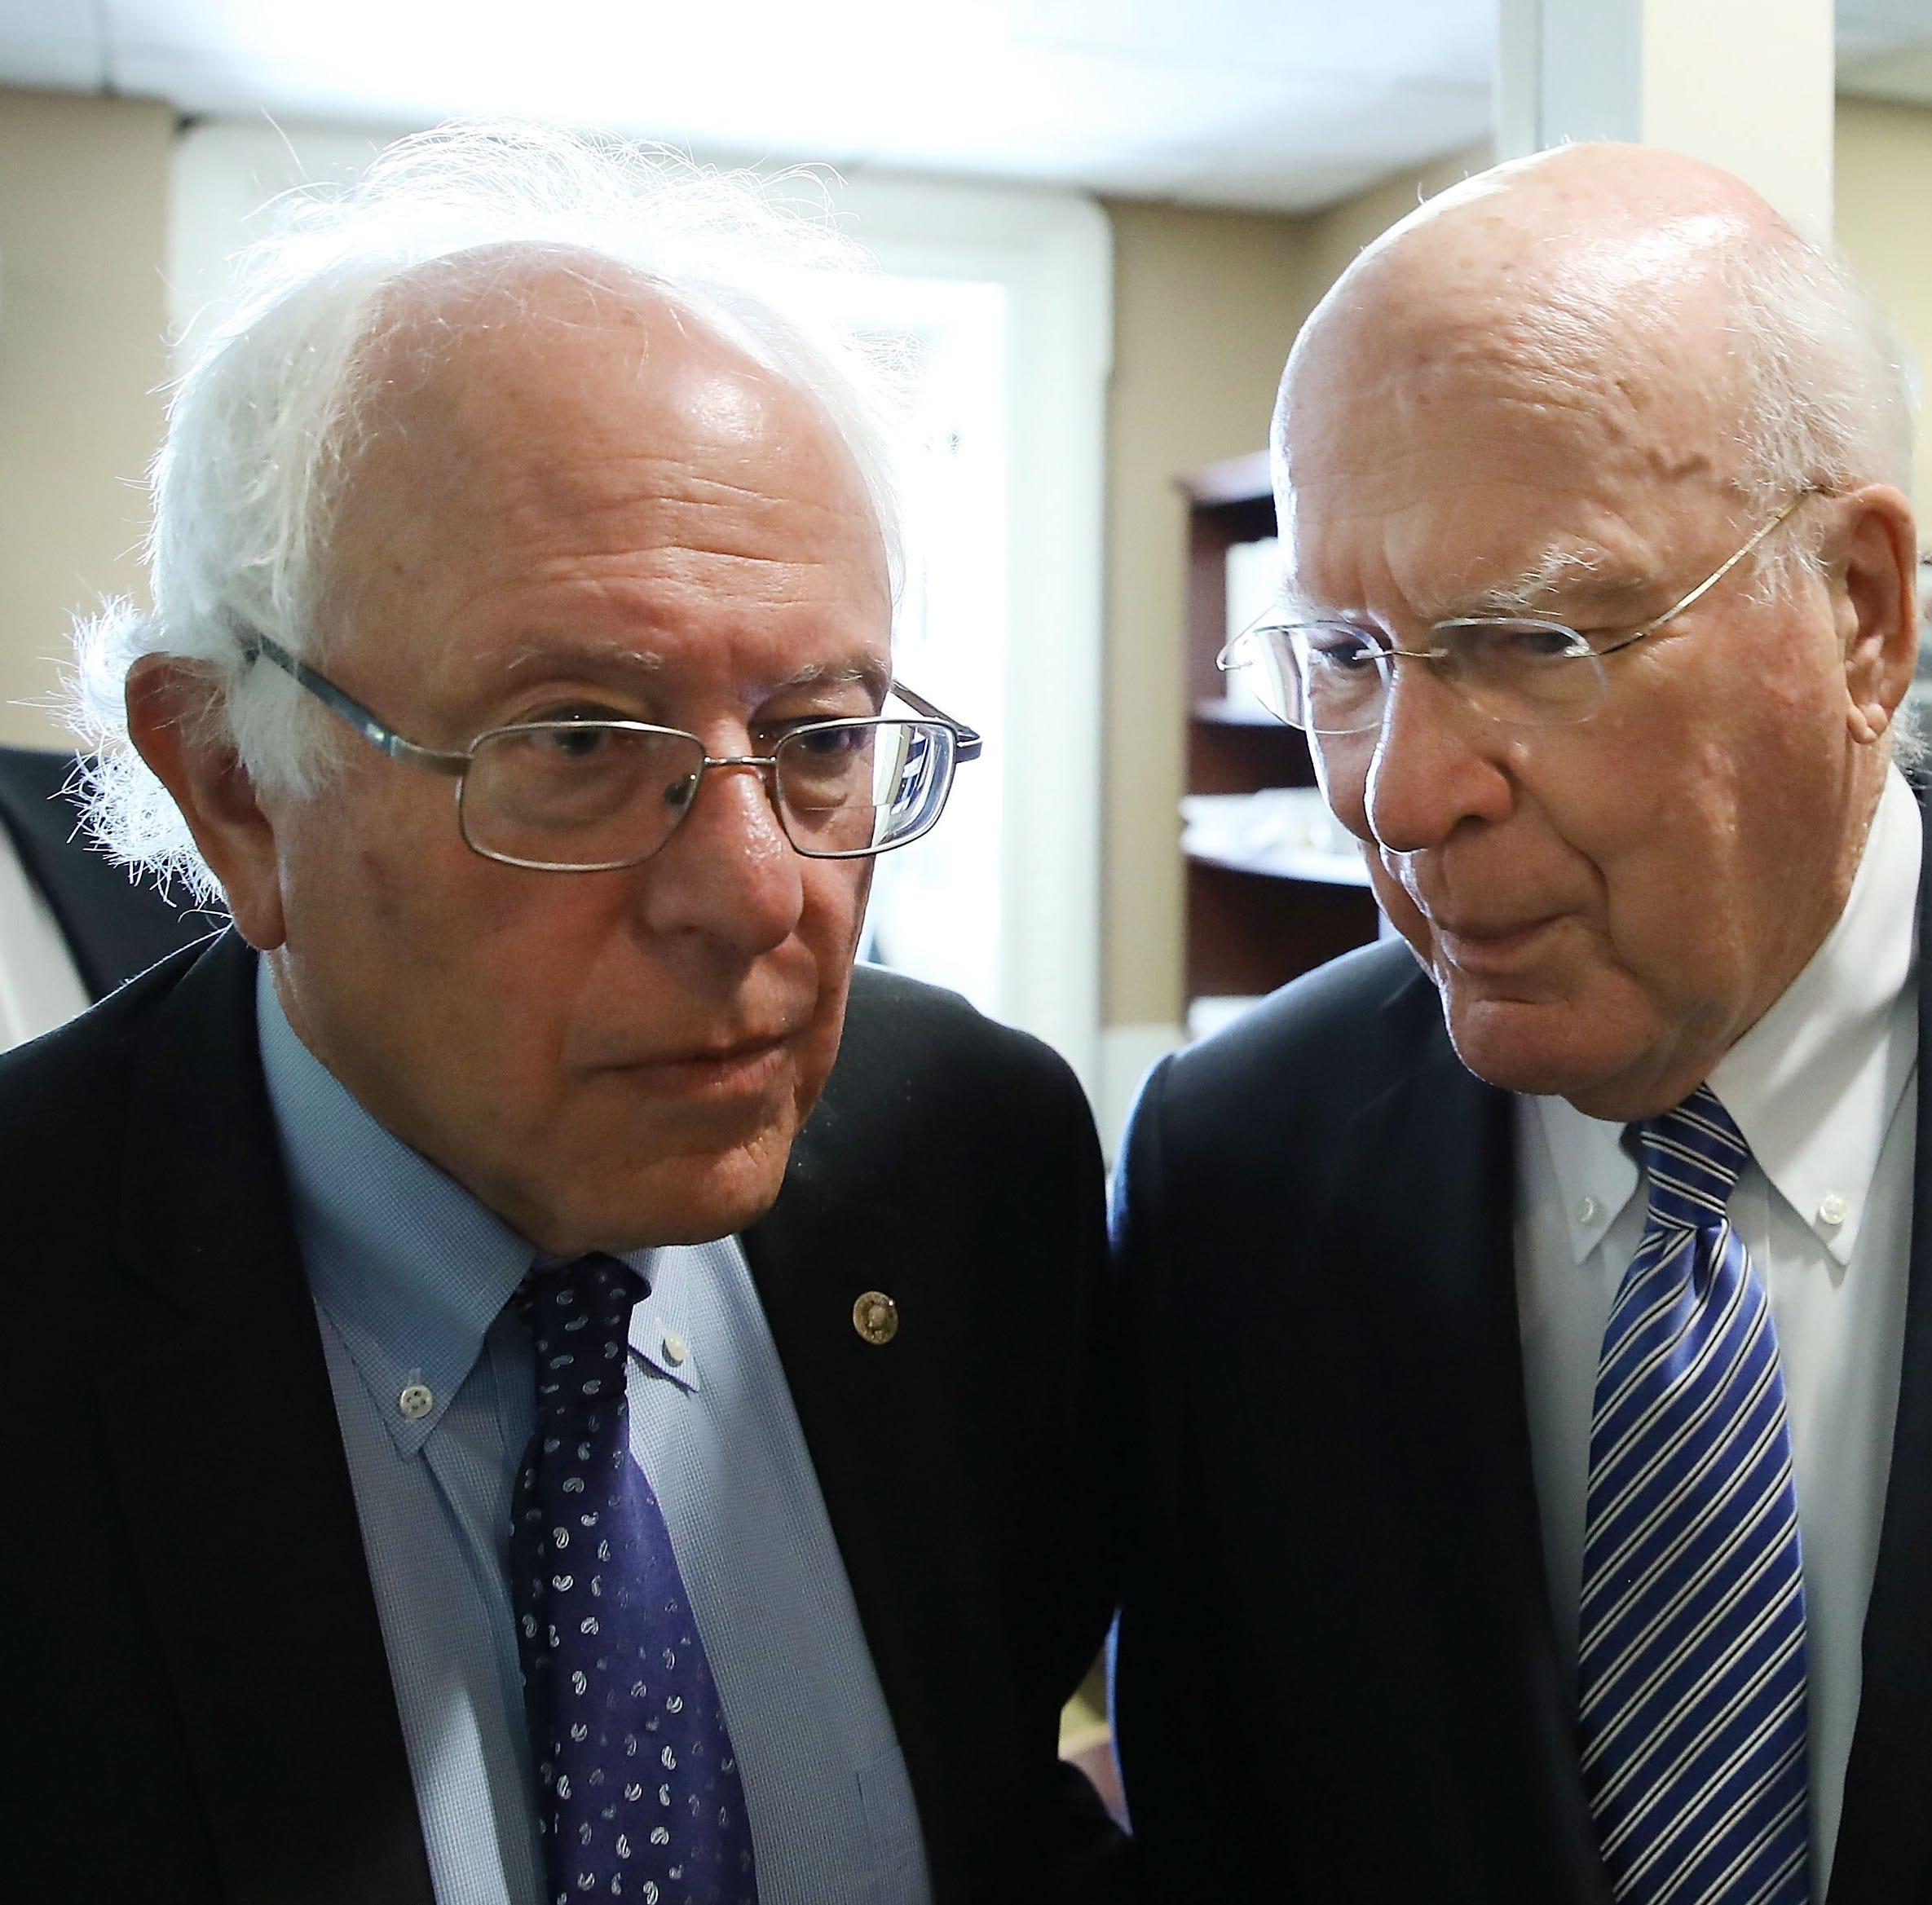 VT Insights: Where Bernie Sanders, Patrick Leahy stand in most popular senators rankings